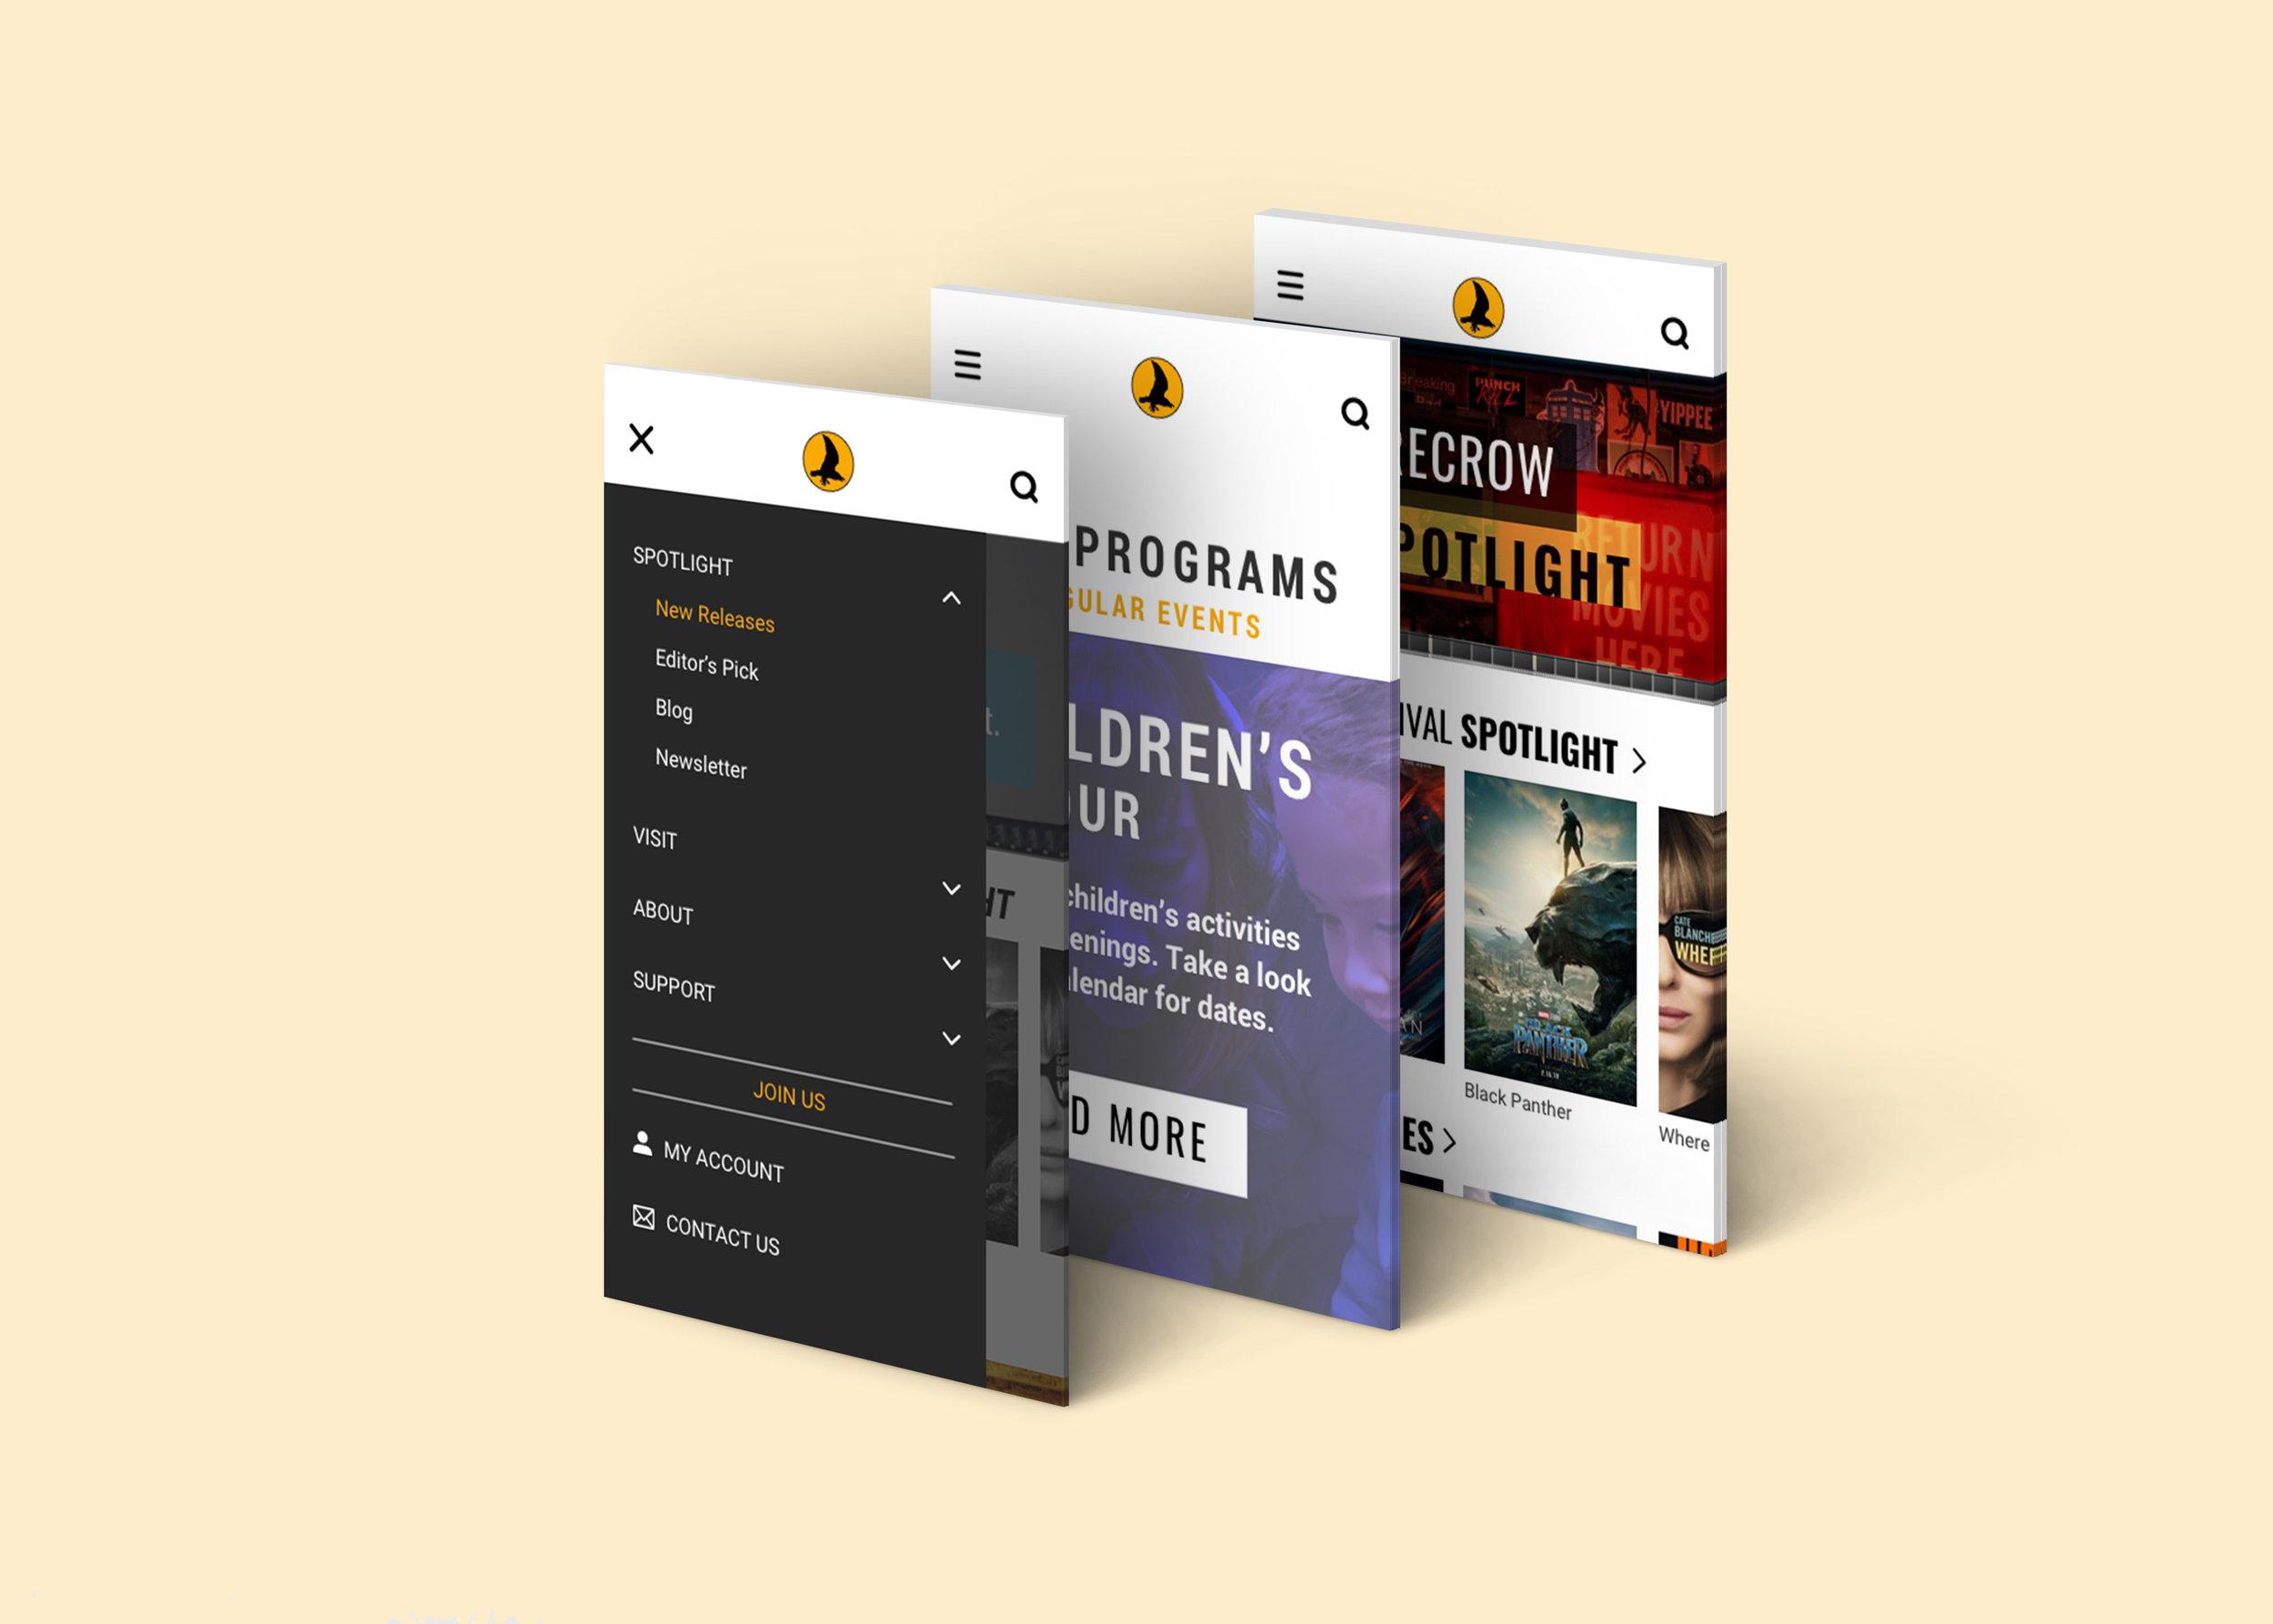 Mobile Screens 1/2